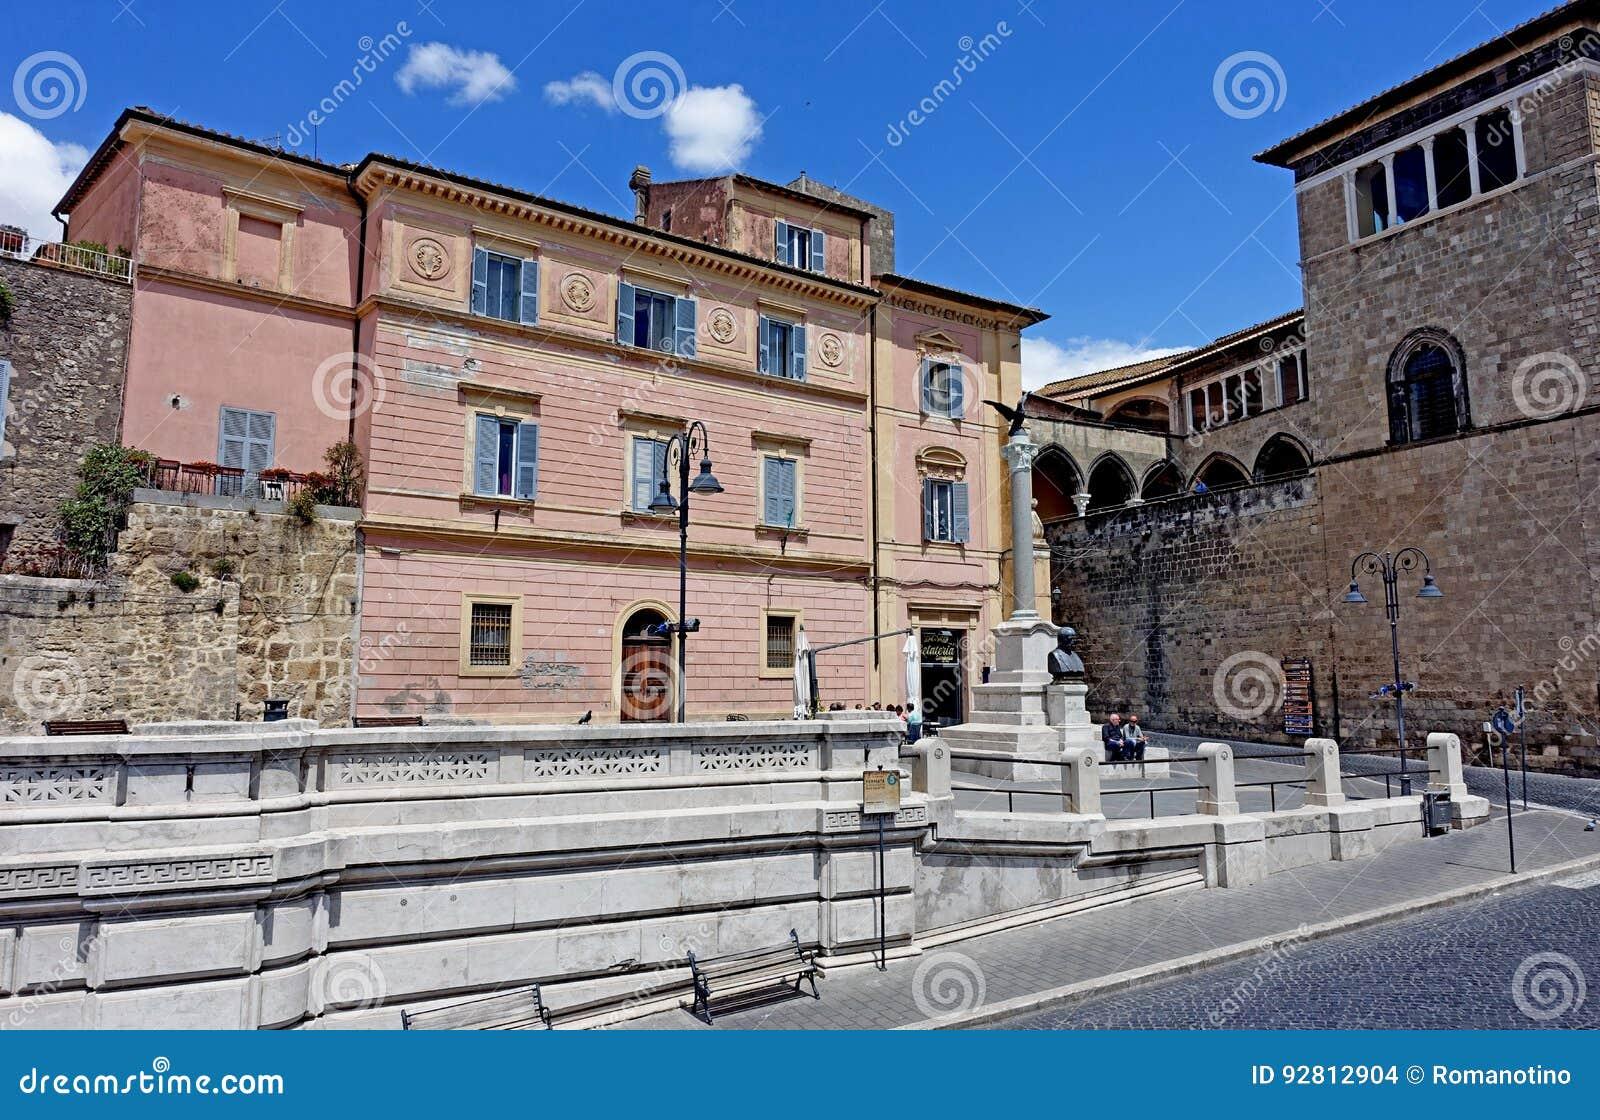 Piazza Cavour di Tarquinia